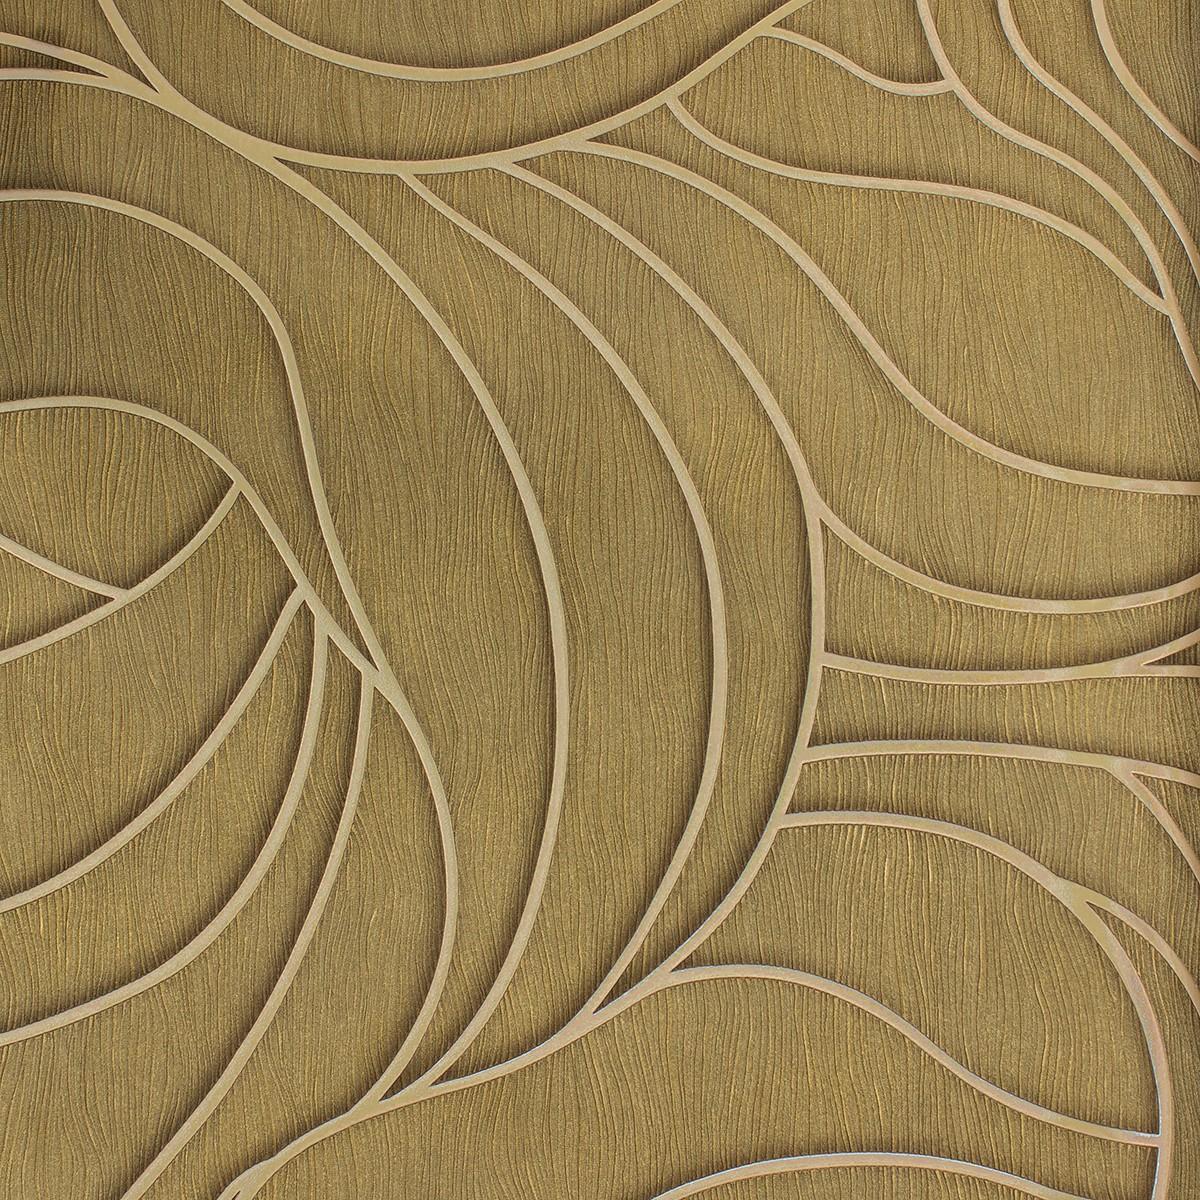 Wallpaper Luigi Colani Marburg 53341 Texture Beige Bronze